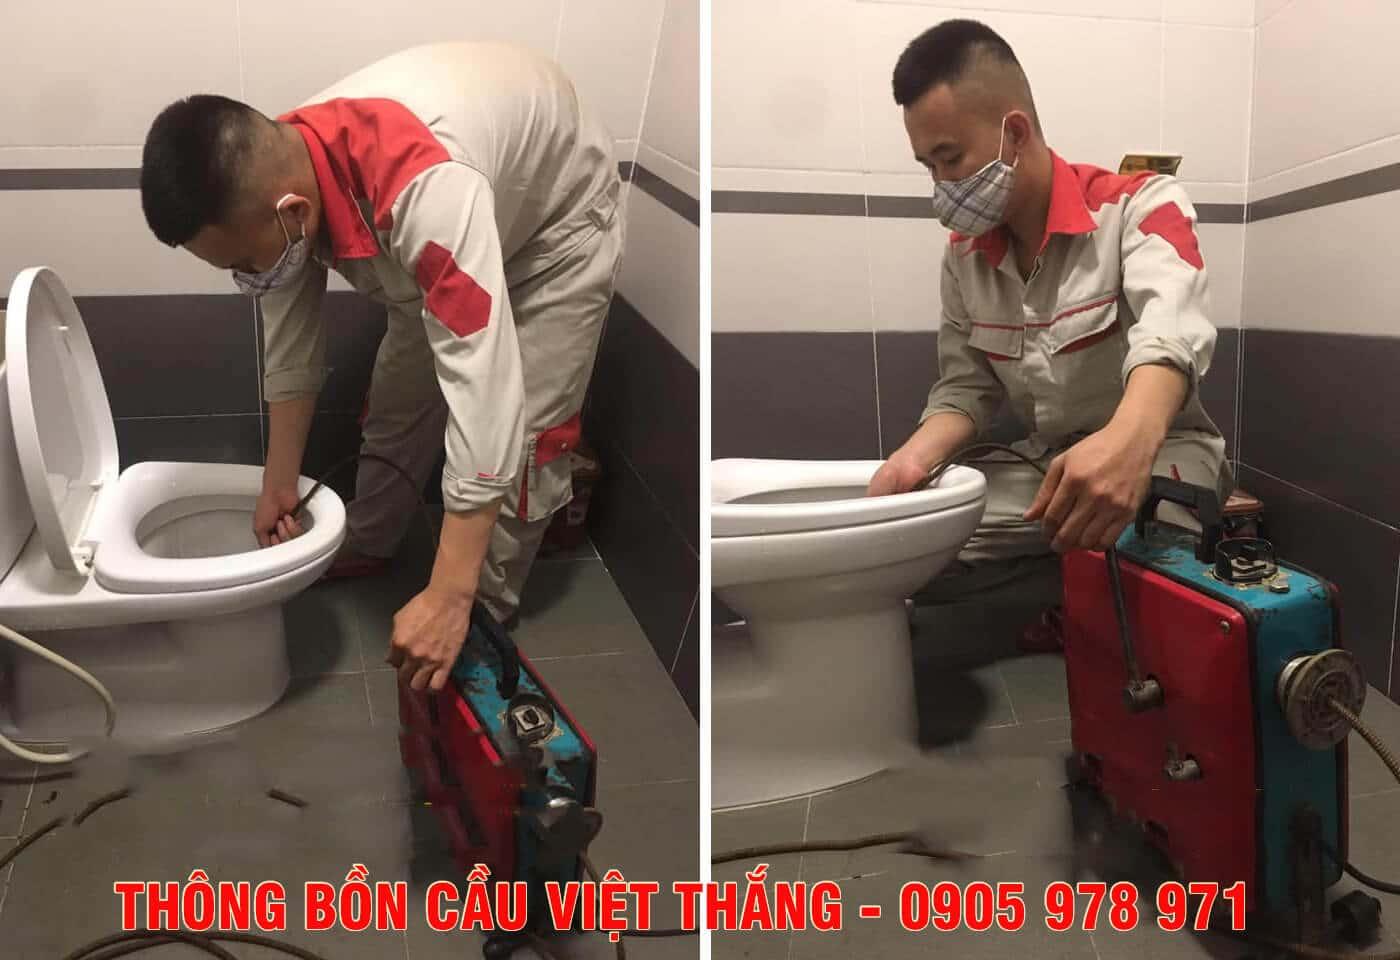 Thong tac bon cau Viet Thang